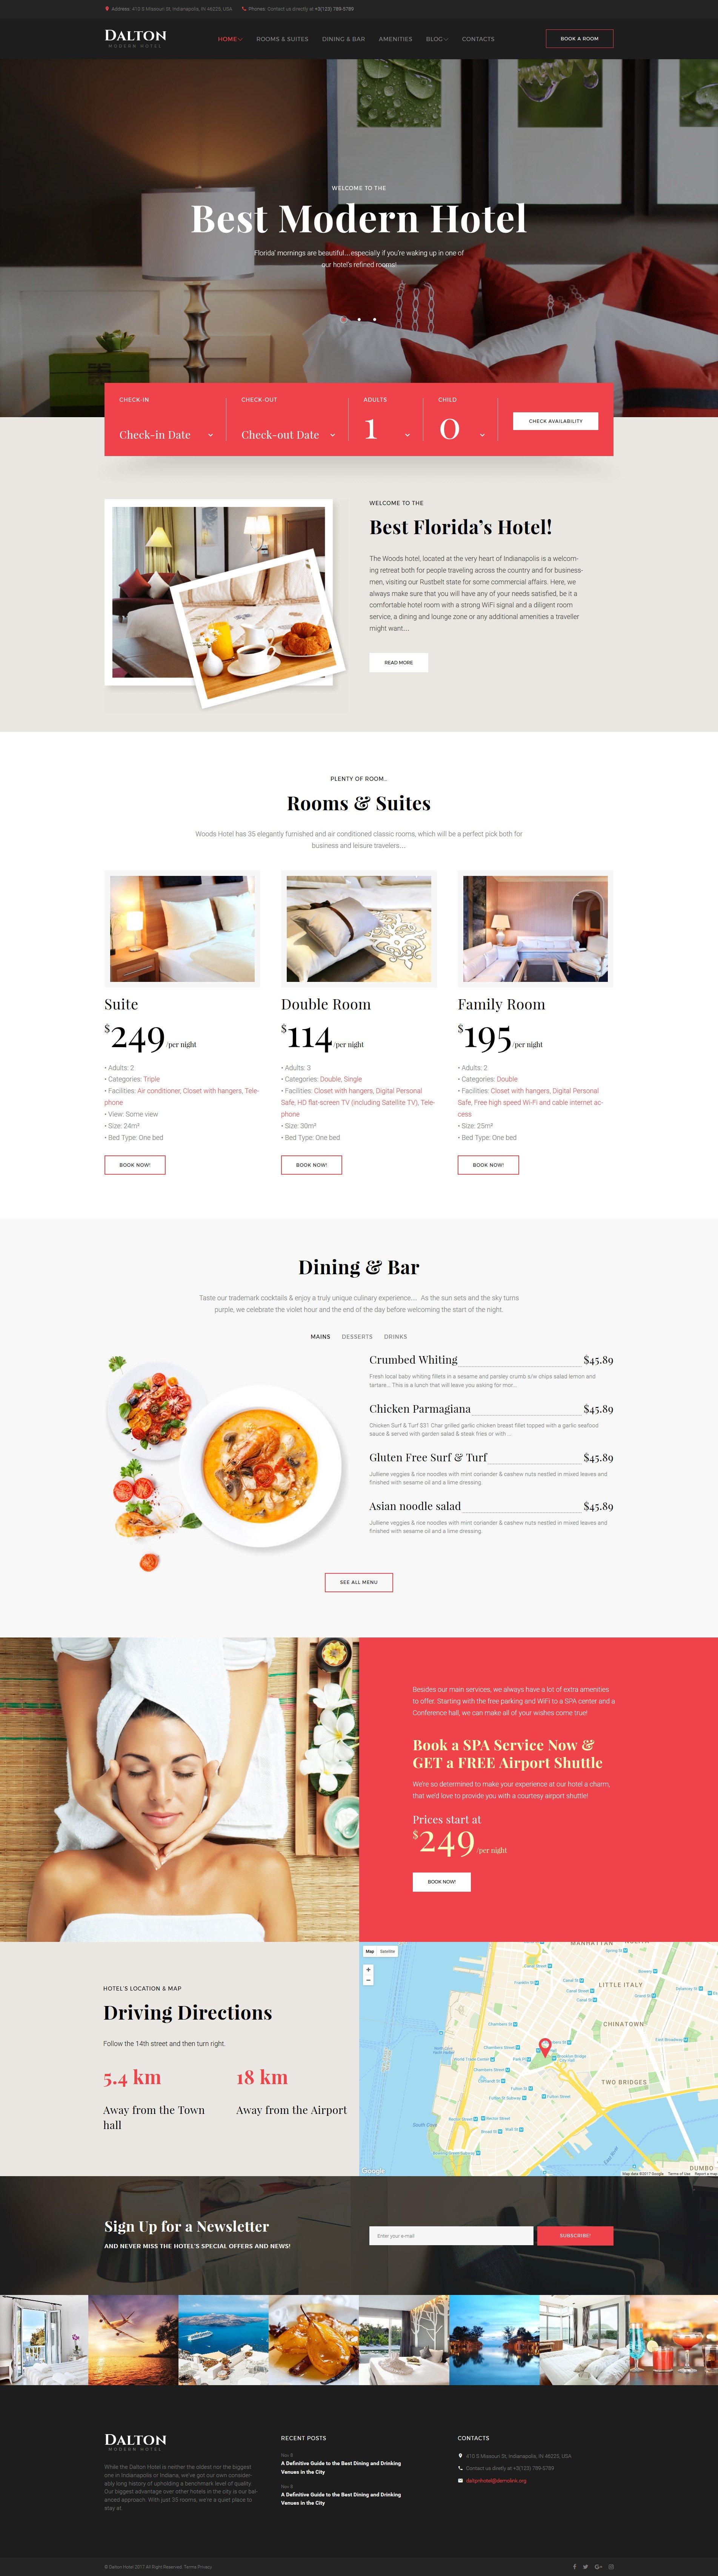 Dalton - Modern Hotel & Resort WordPress Theme - screenshot